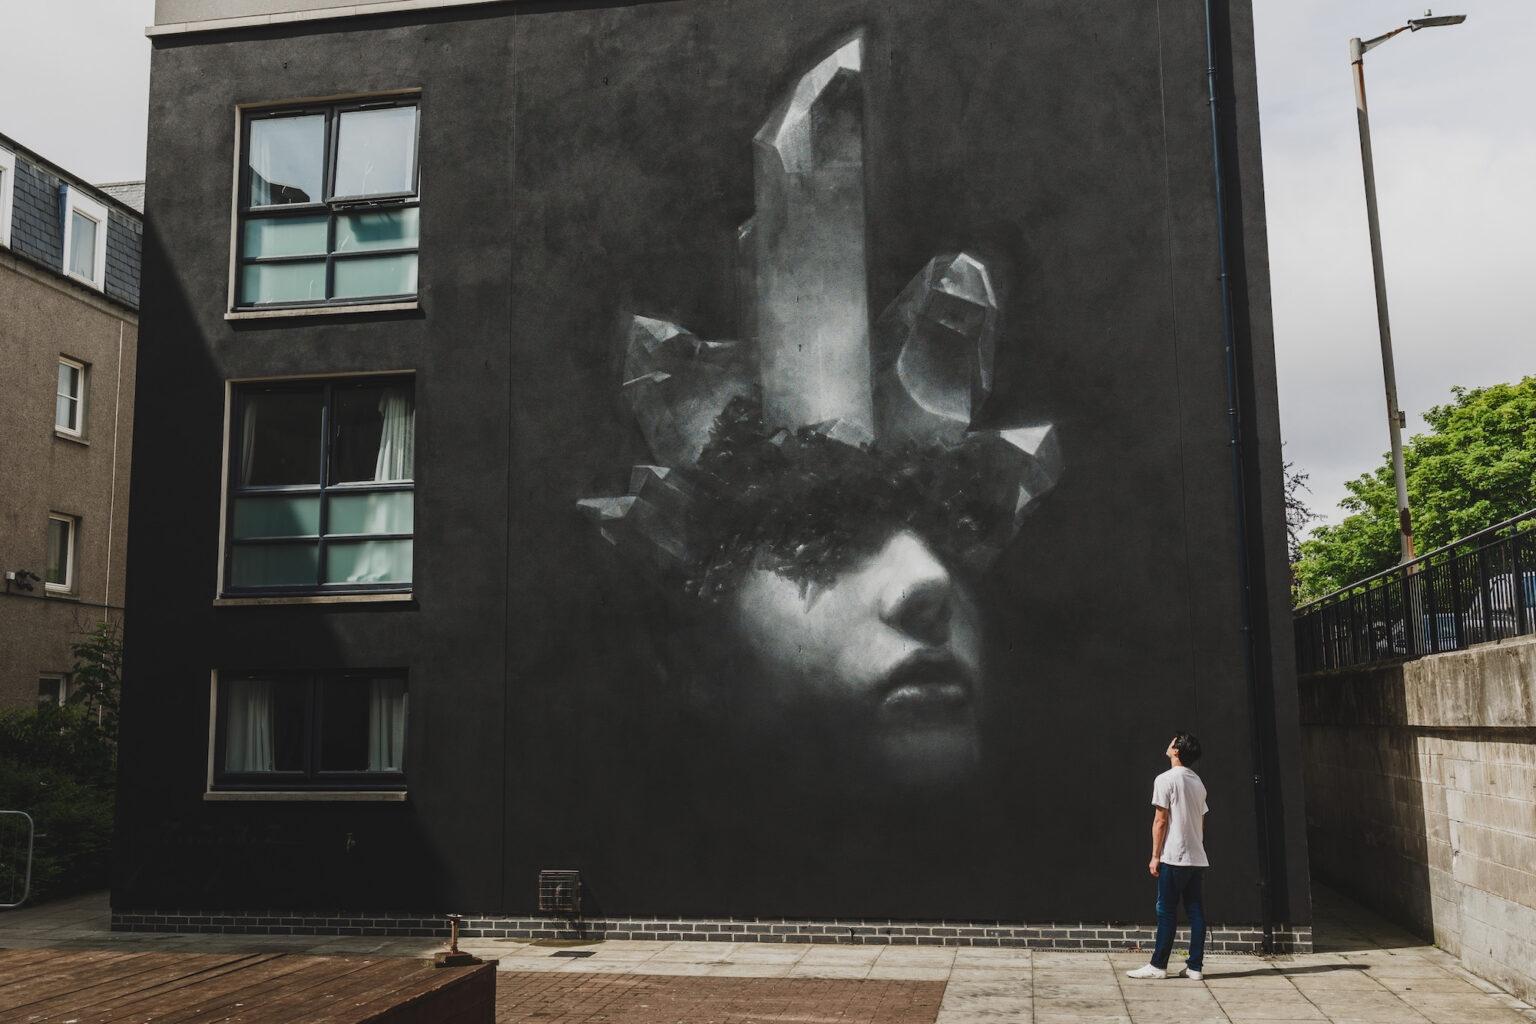 Mural by Henrik Uldalen in Aberdeen, Scotland